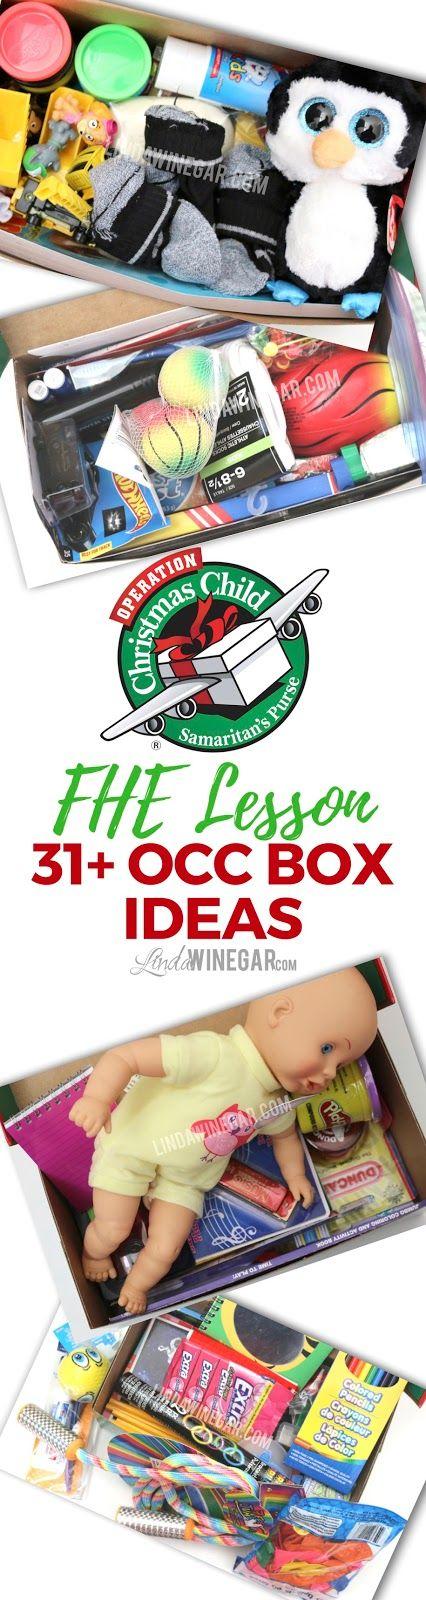 FHE: Operation Christmas Child w/ 31+ Box Ideas! | Linda Winegar